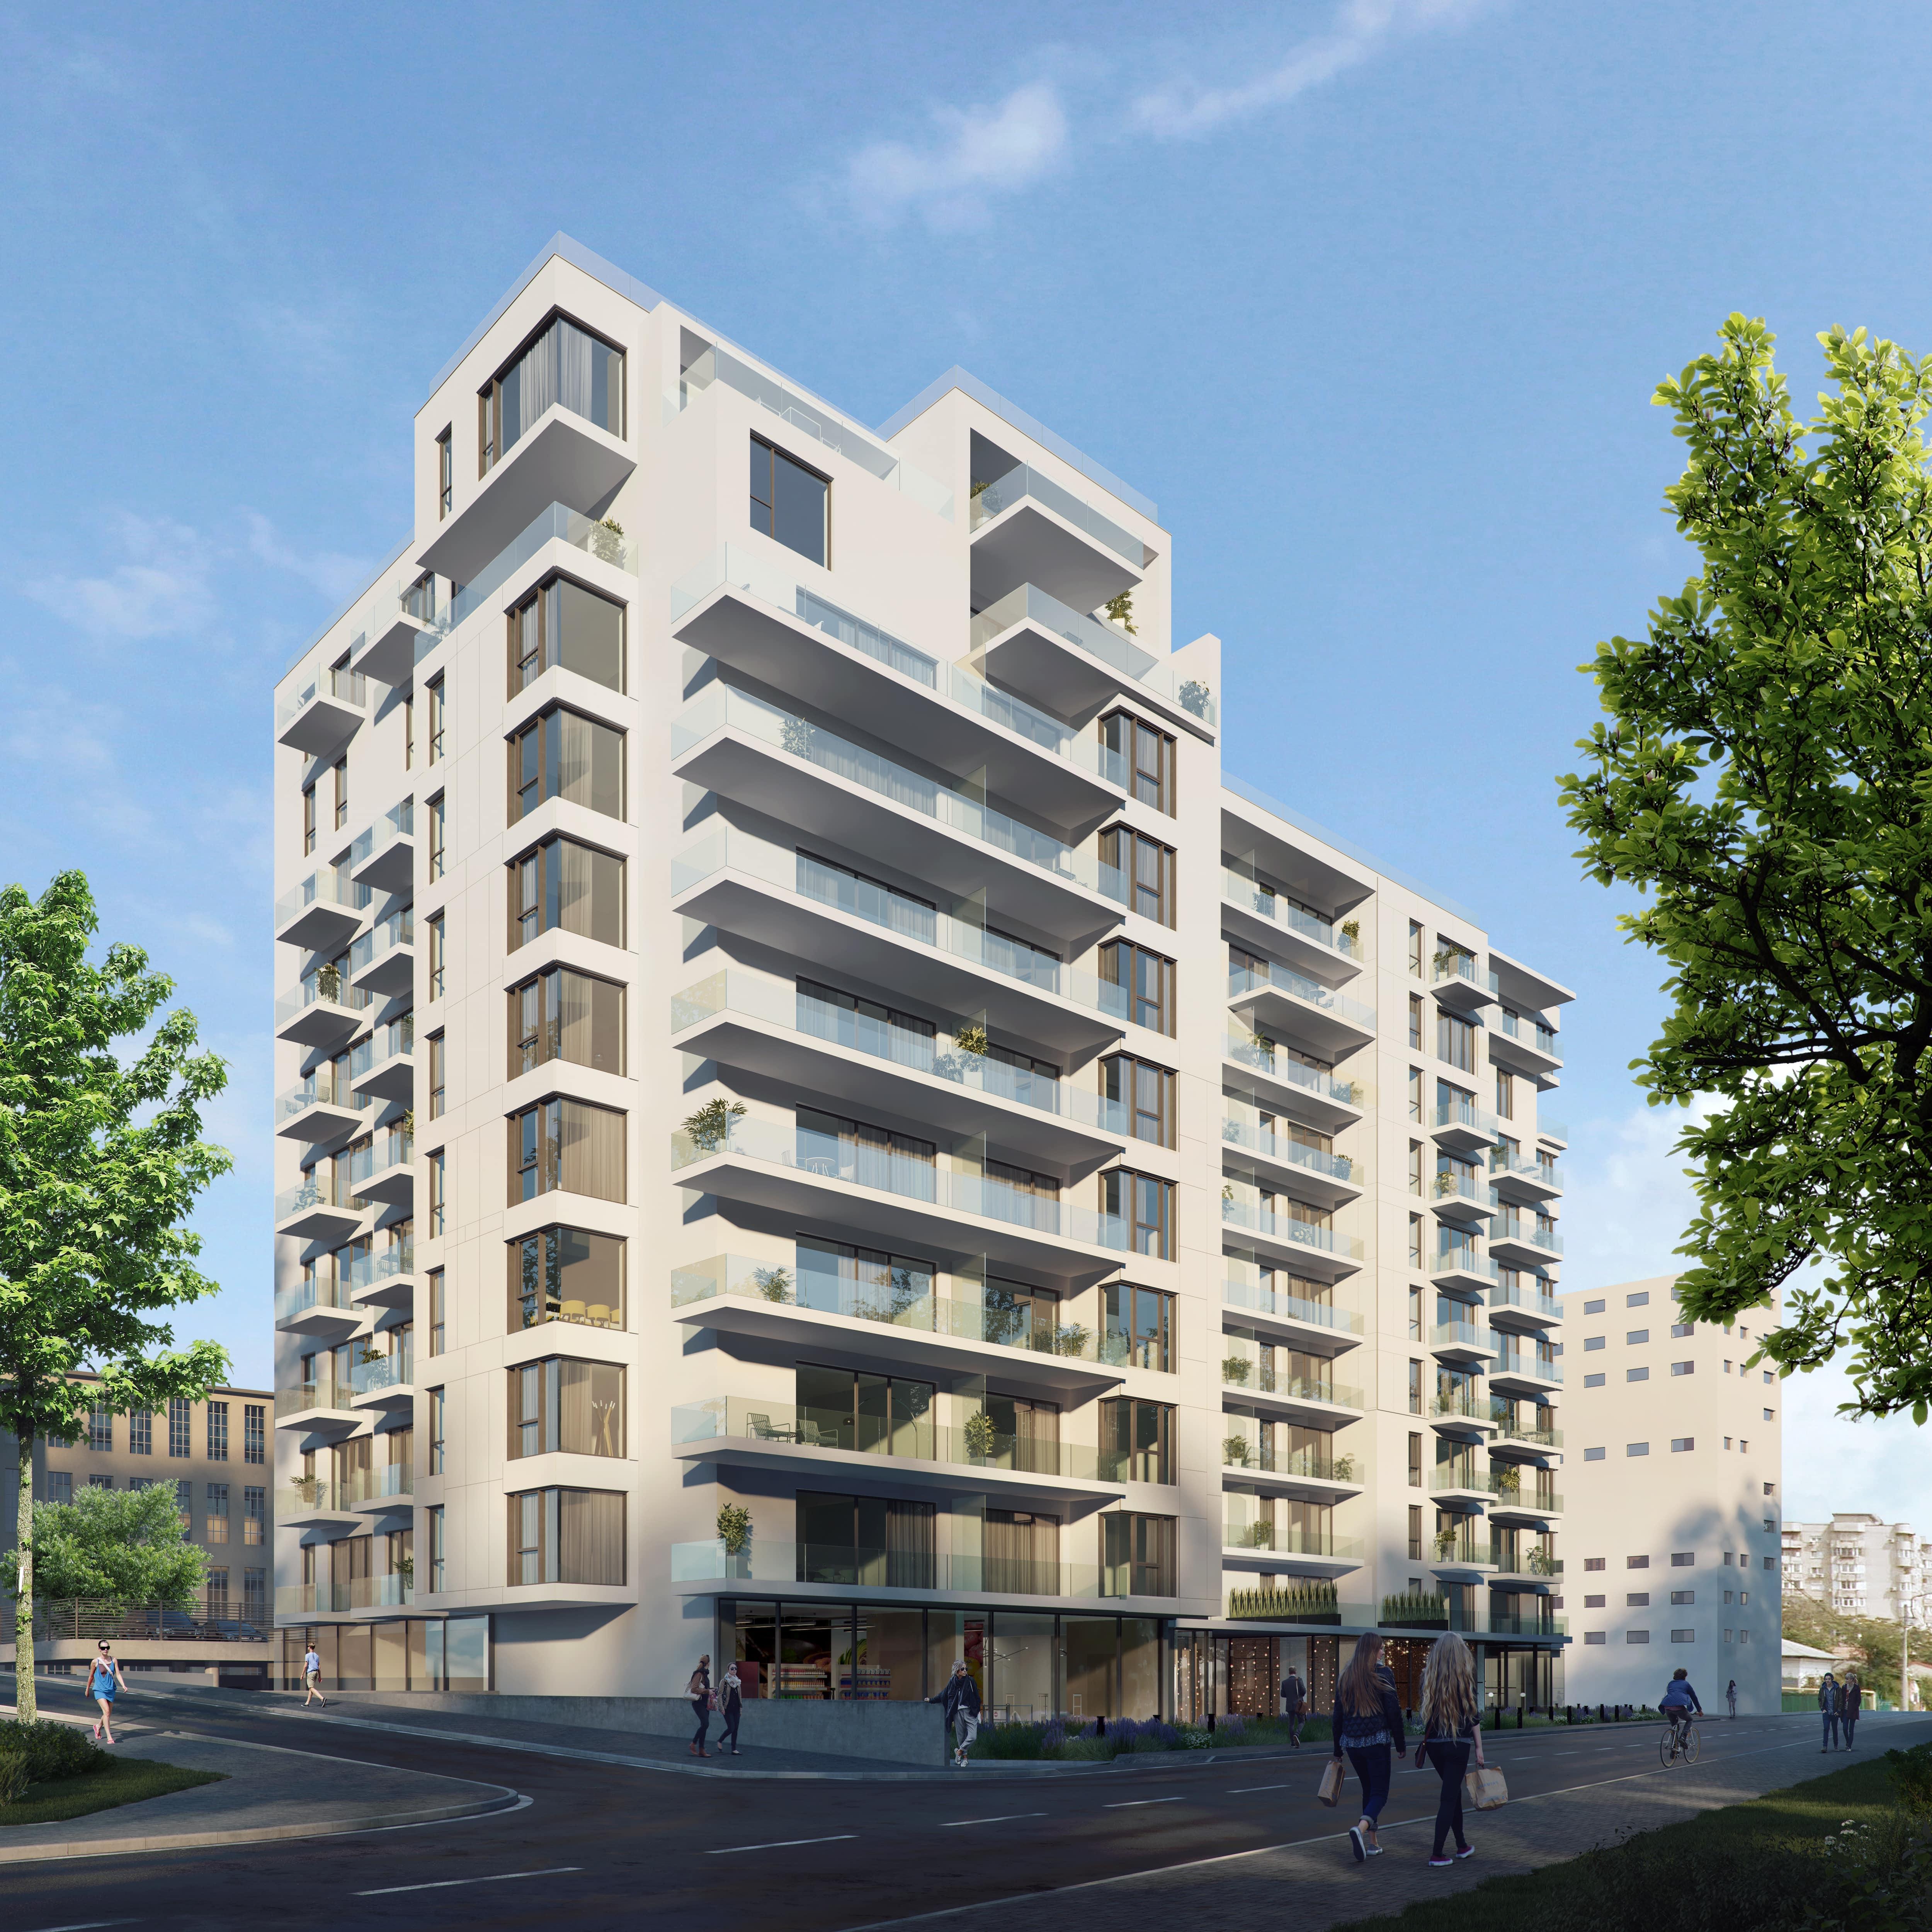 https://ahe-ro.s3.amazonaws.com/8255/penthouse-si-apartamente-unirii-%286%29.jpg